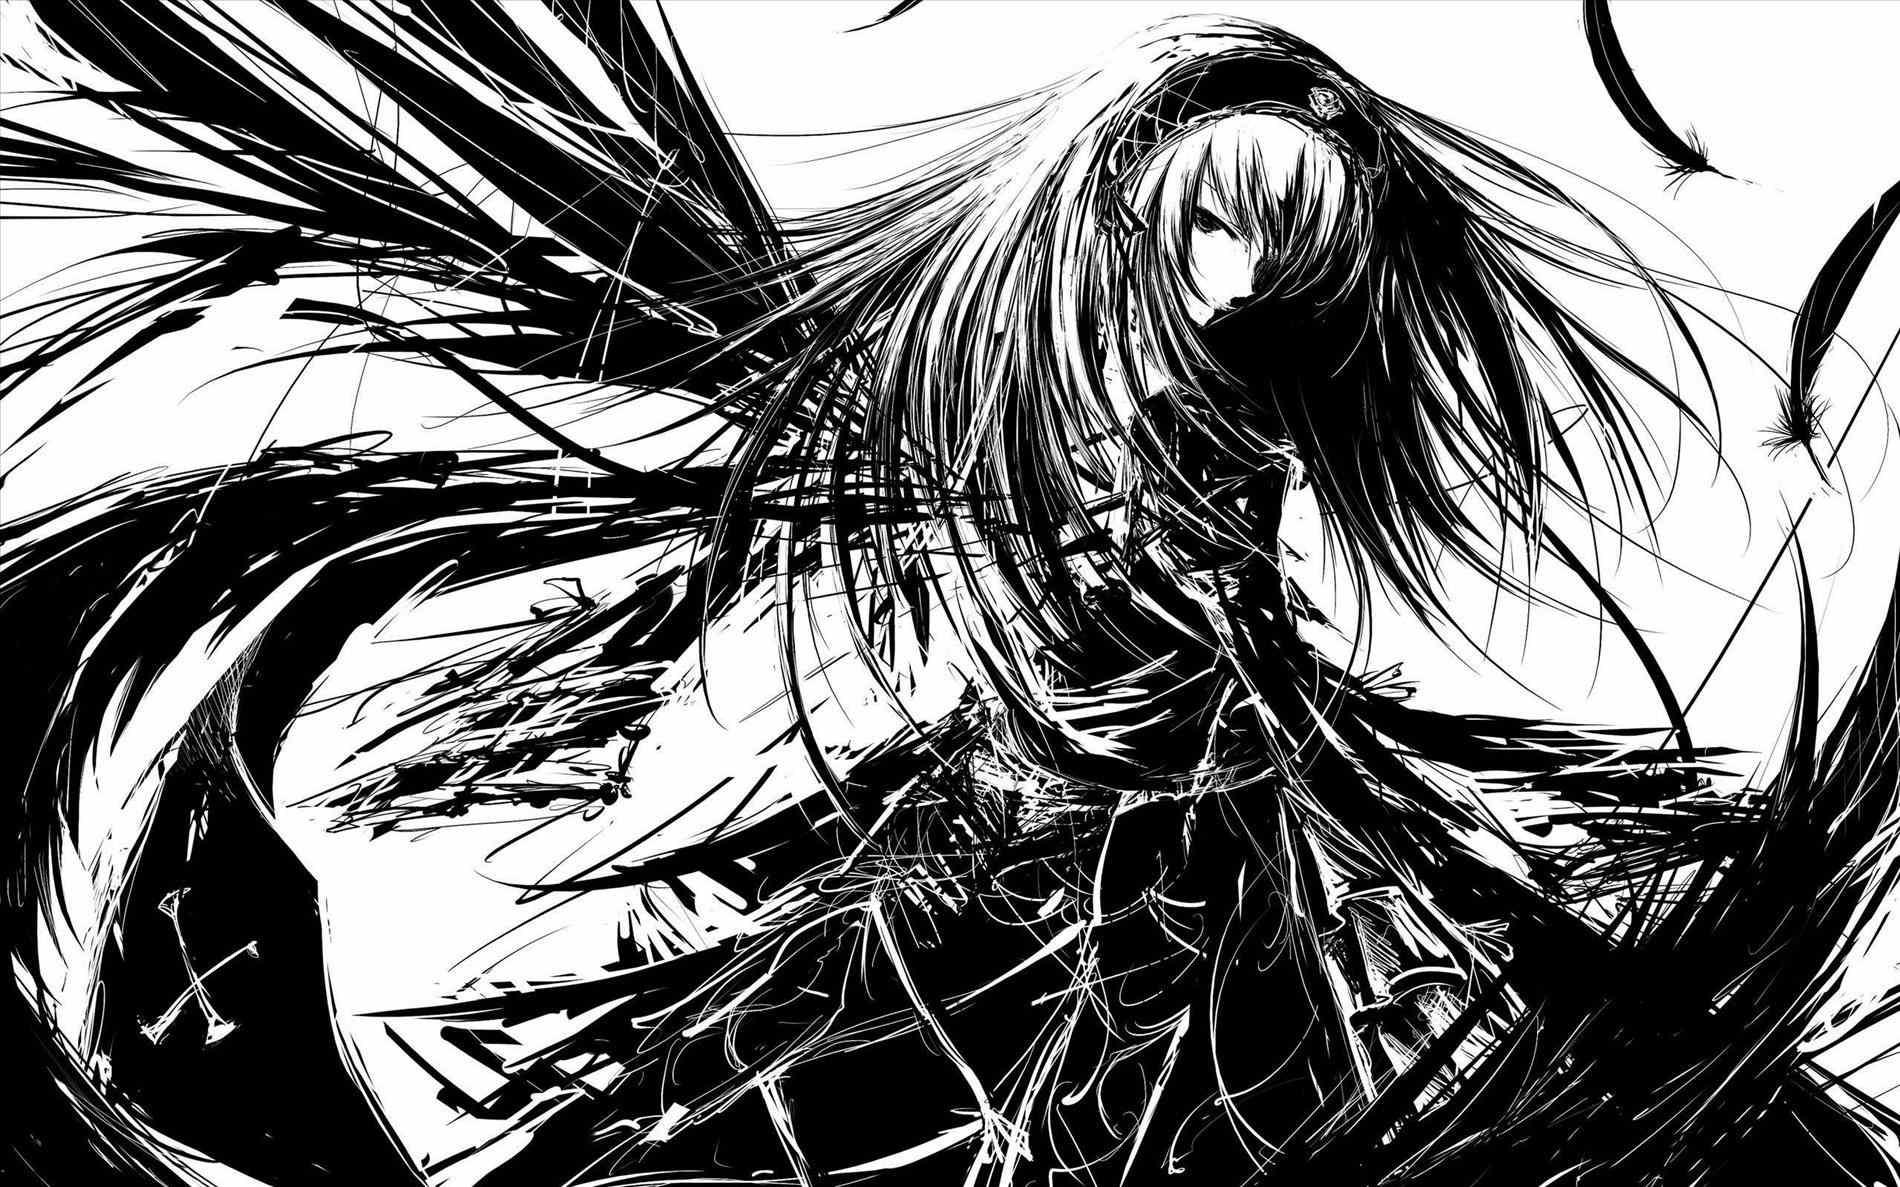 anime fallen angel wallpaper desktop i hd images s backgrounds abyss